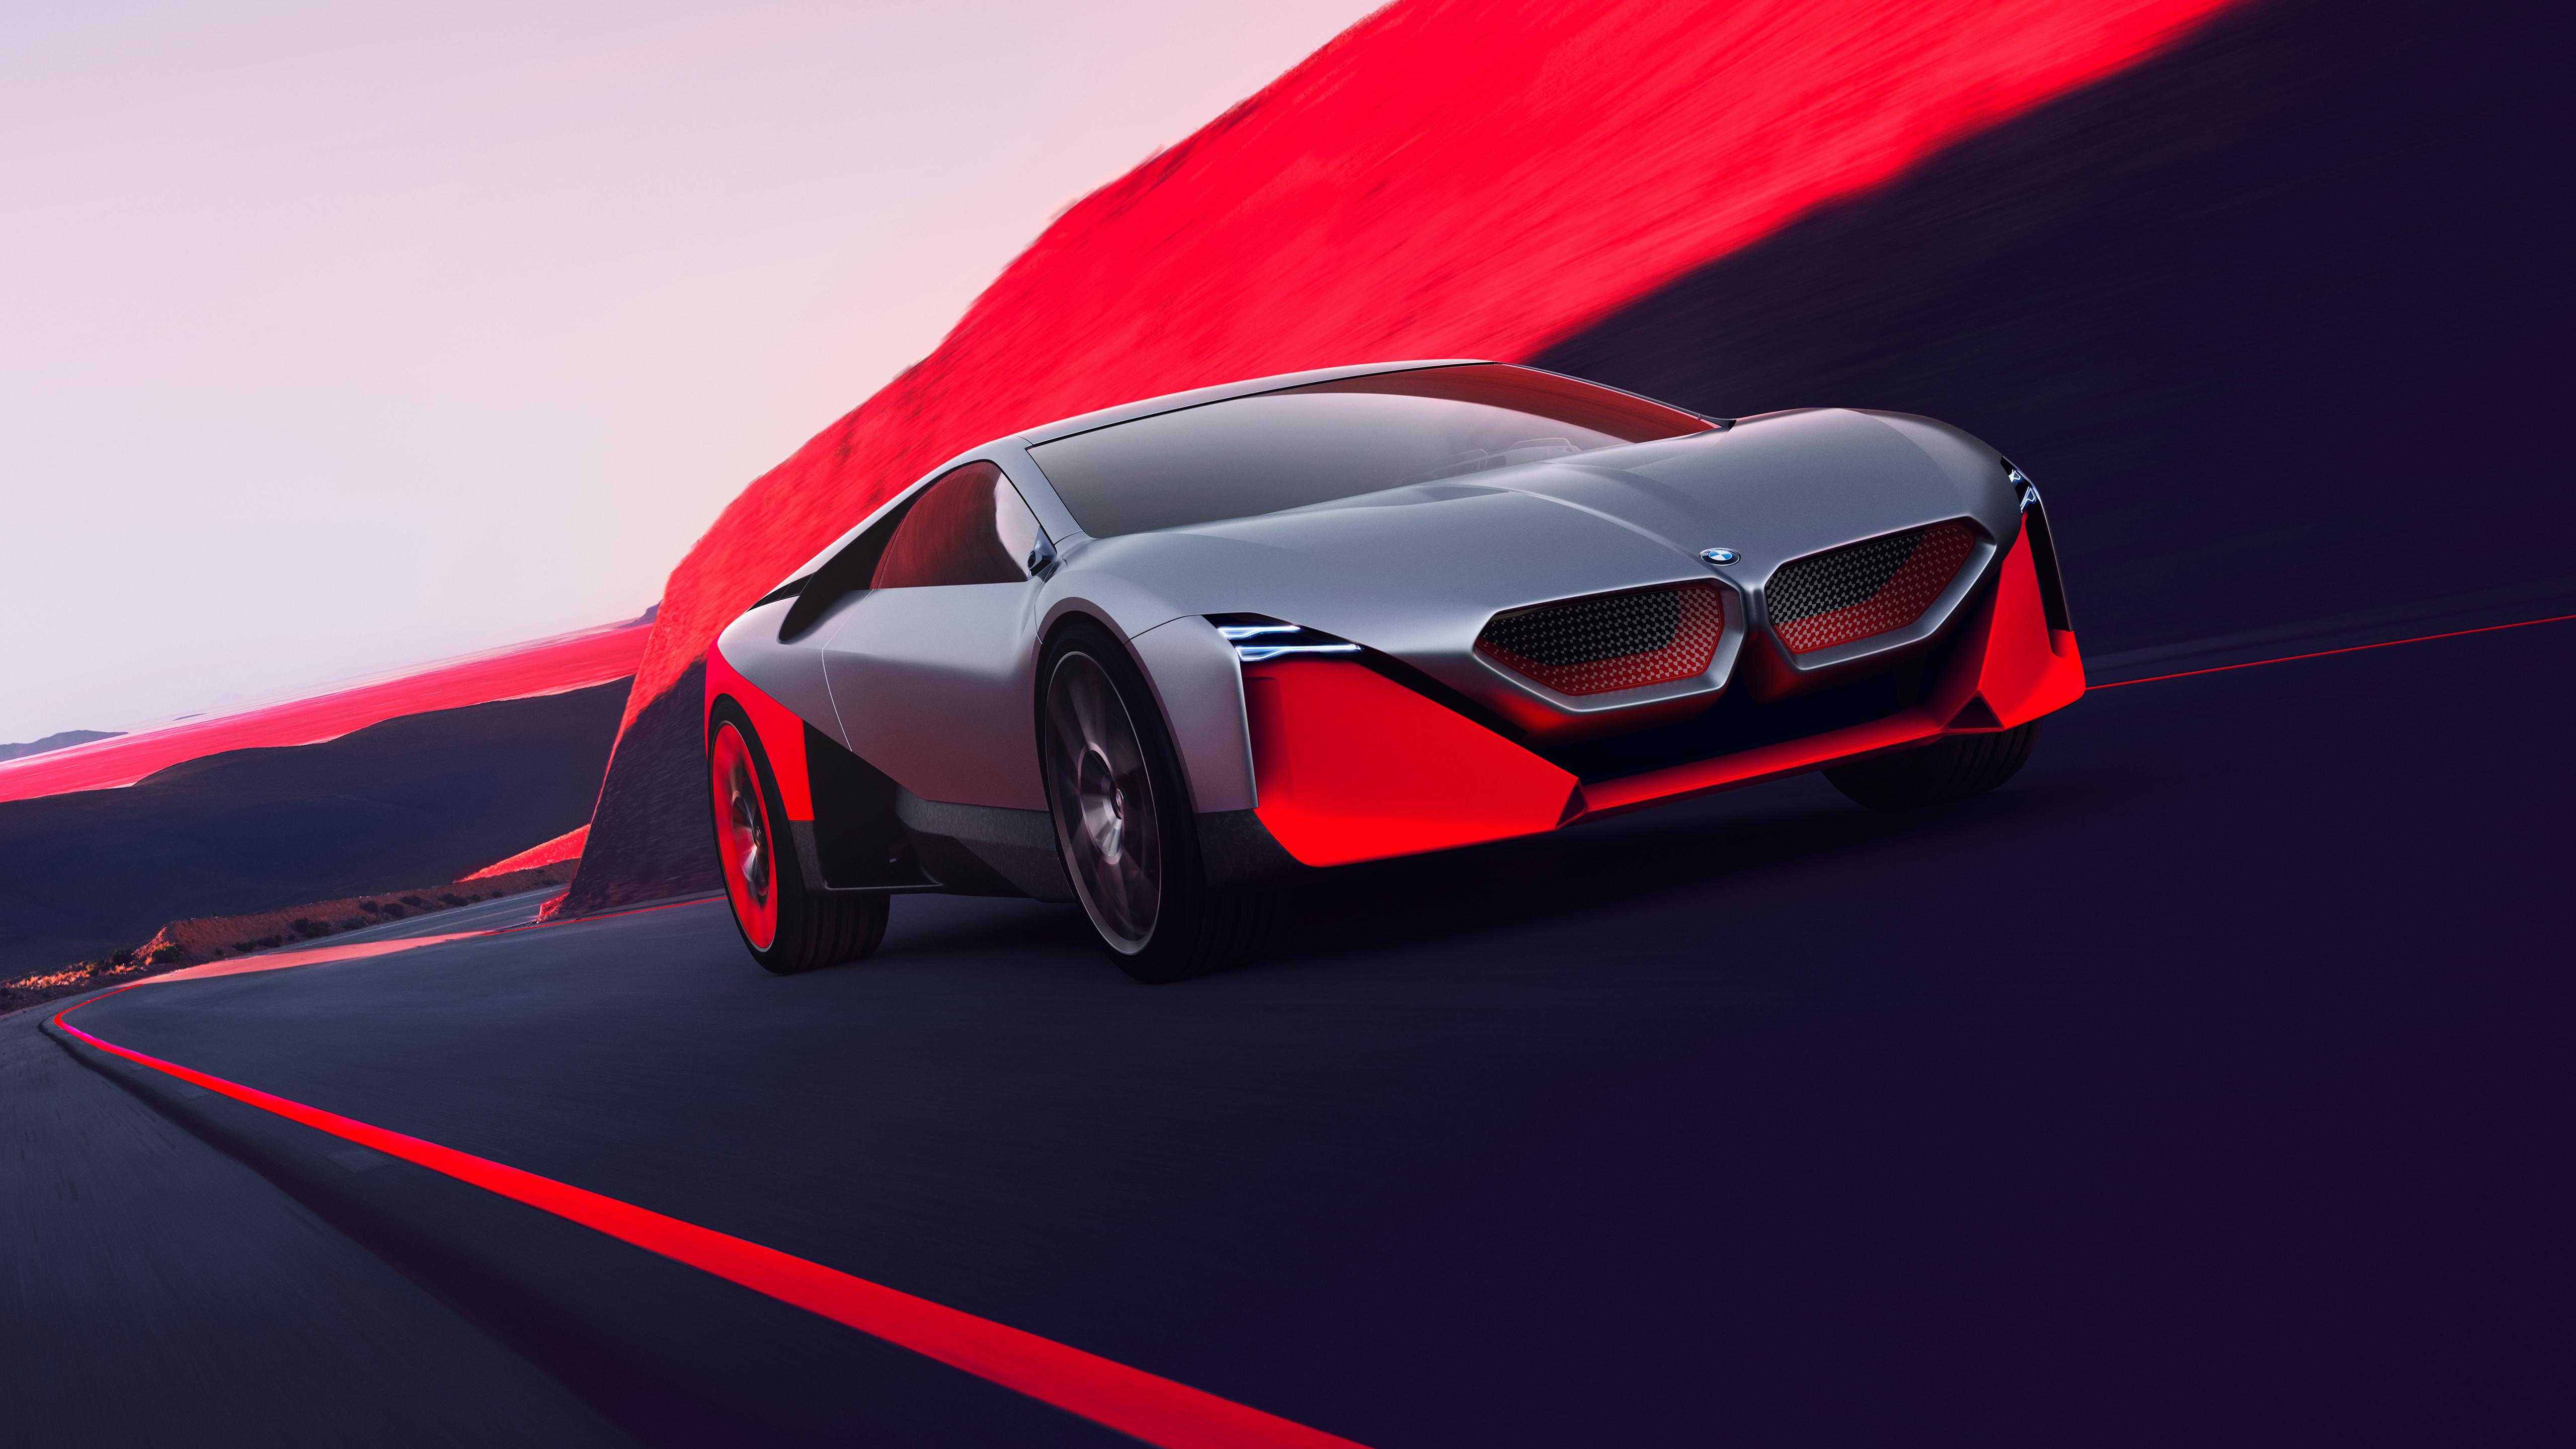 Bmw Vision M Next 2019 4k 8 Wallpaper Hd Car Wallpapers Id 12811